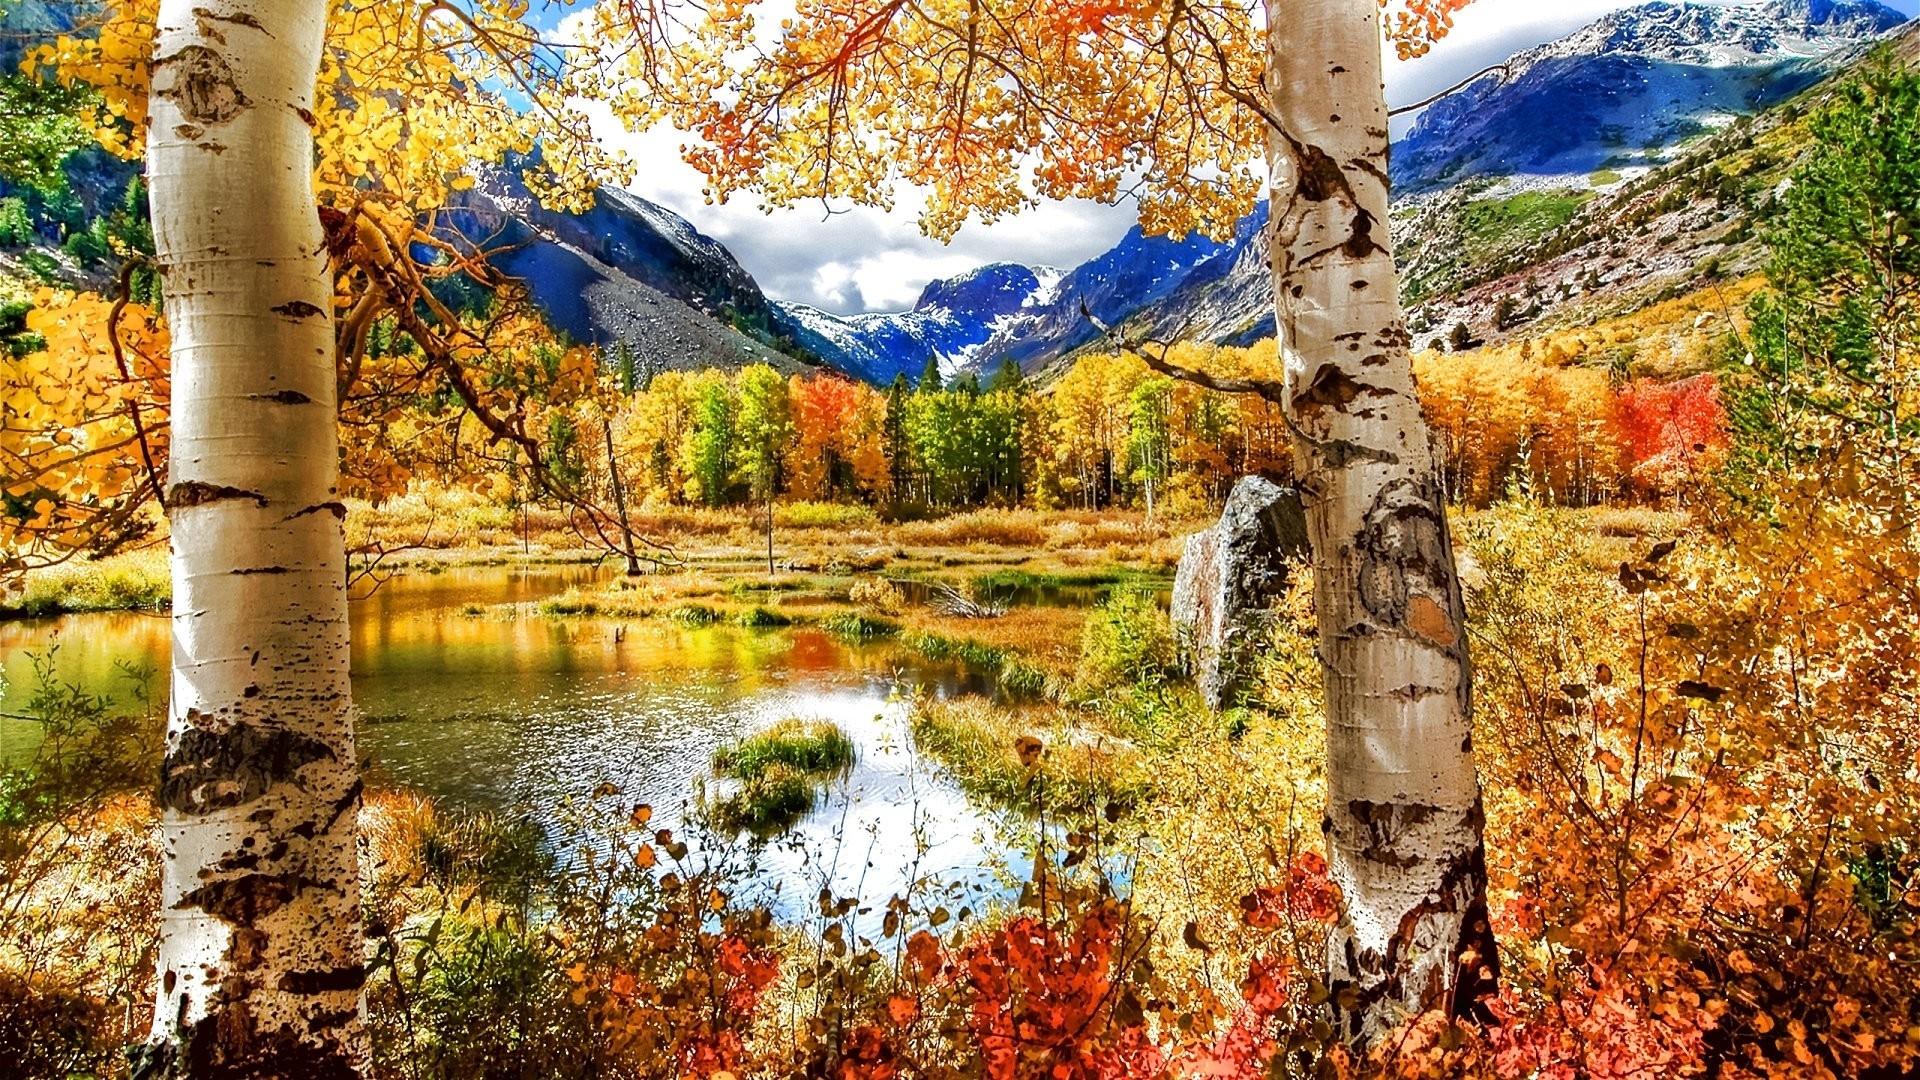 Seasons Tag – Tree Fall Season Seasons Landscape Leaf Autumn Color Forest  Leaves Nature Wallpaper Hd